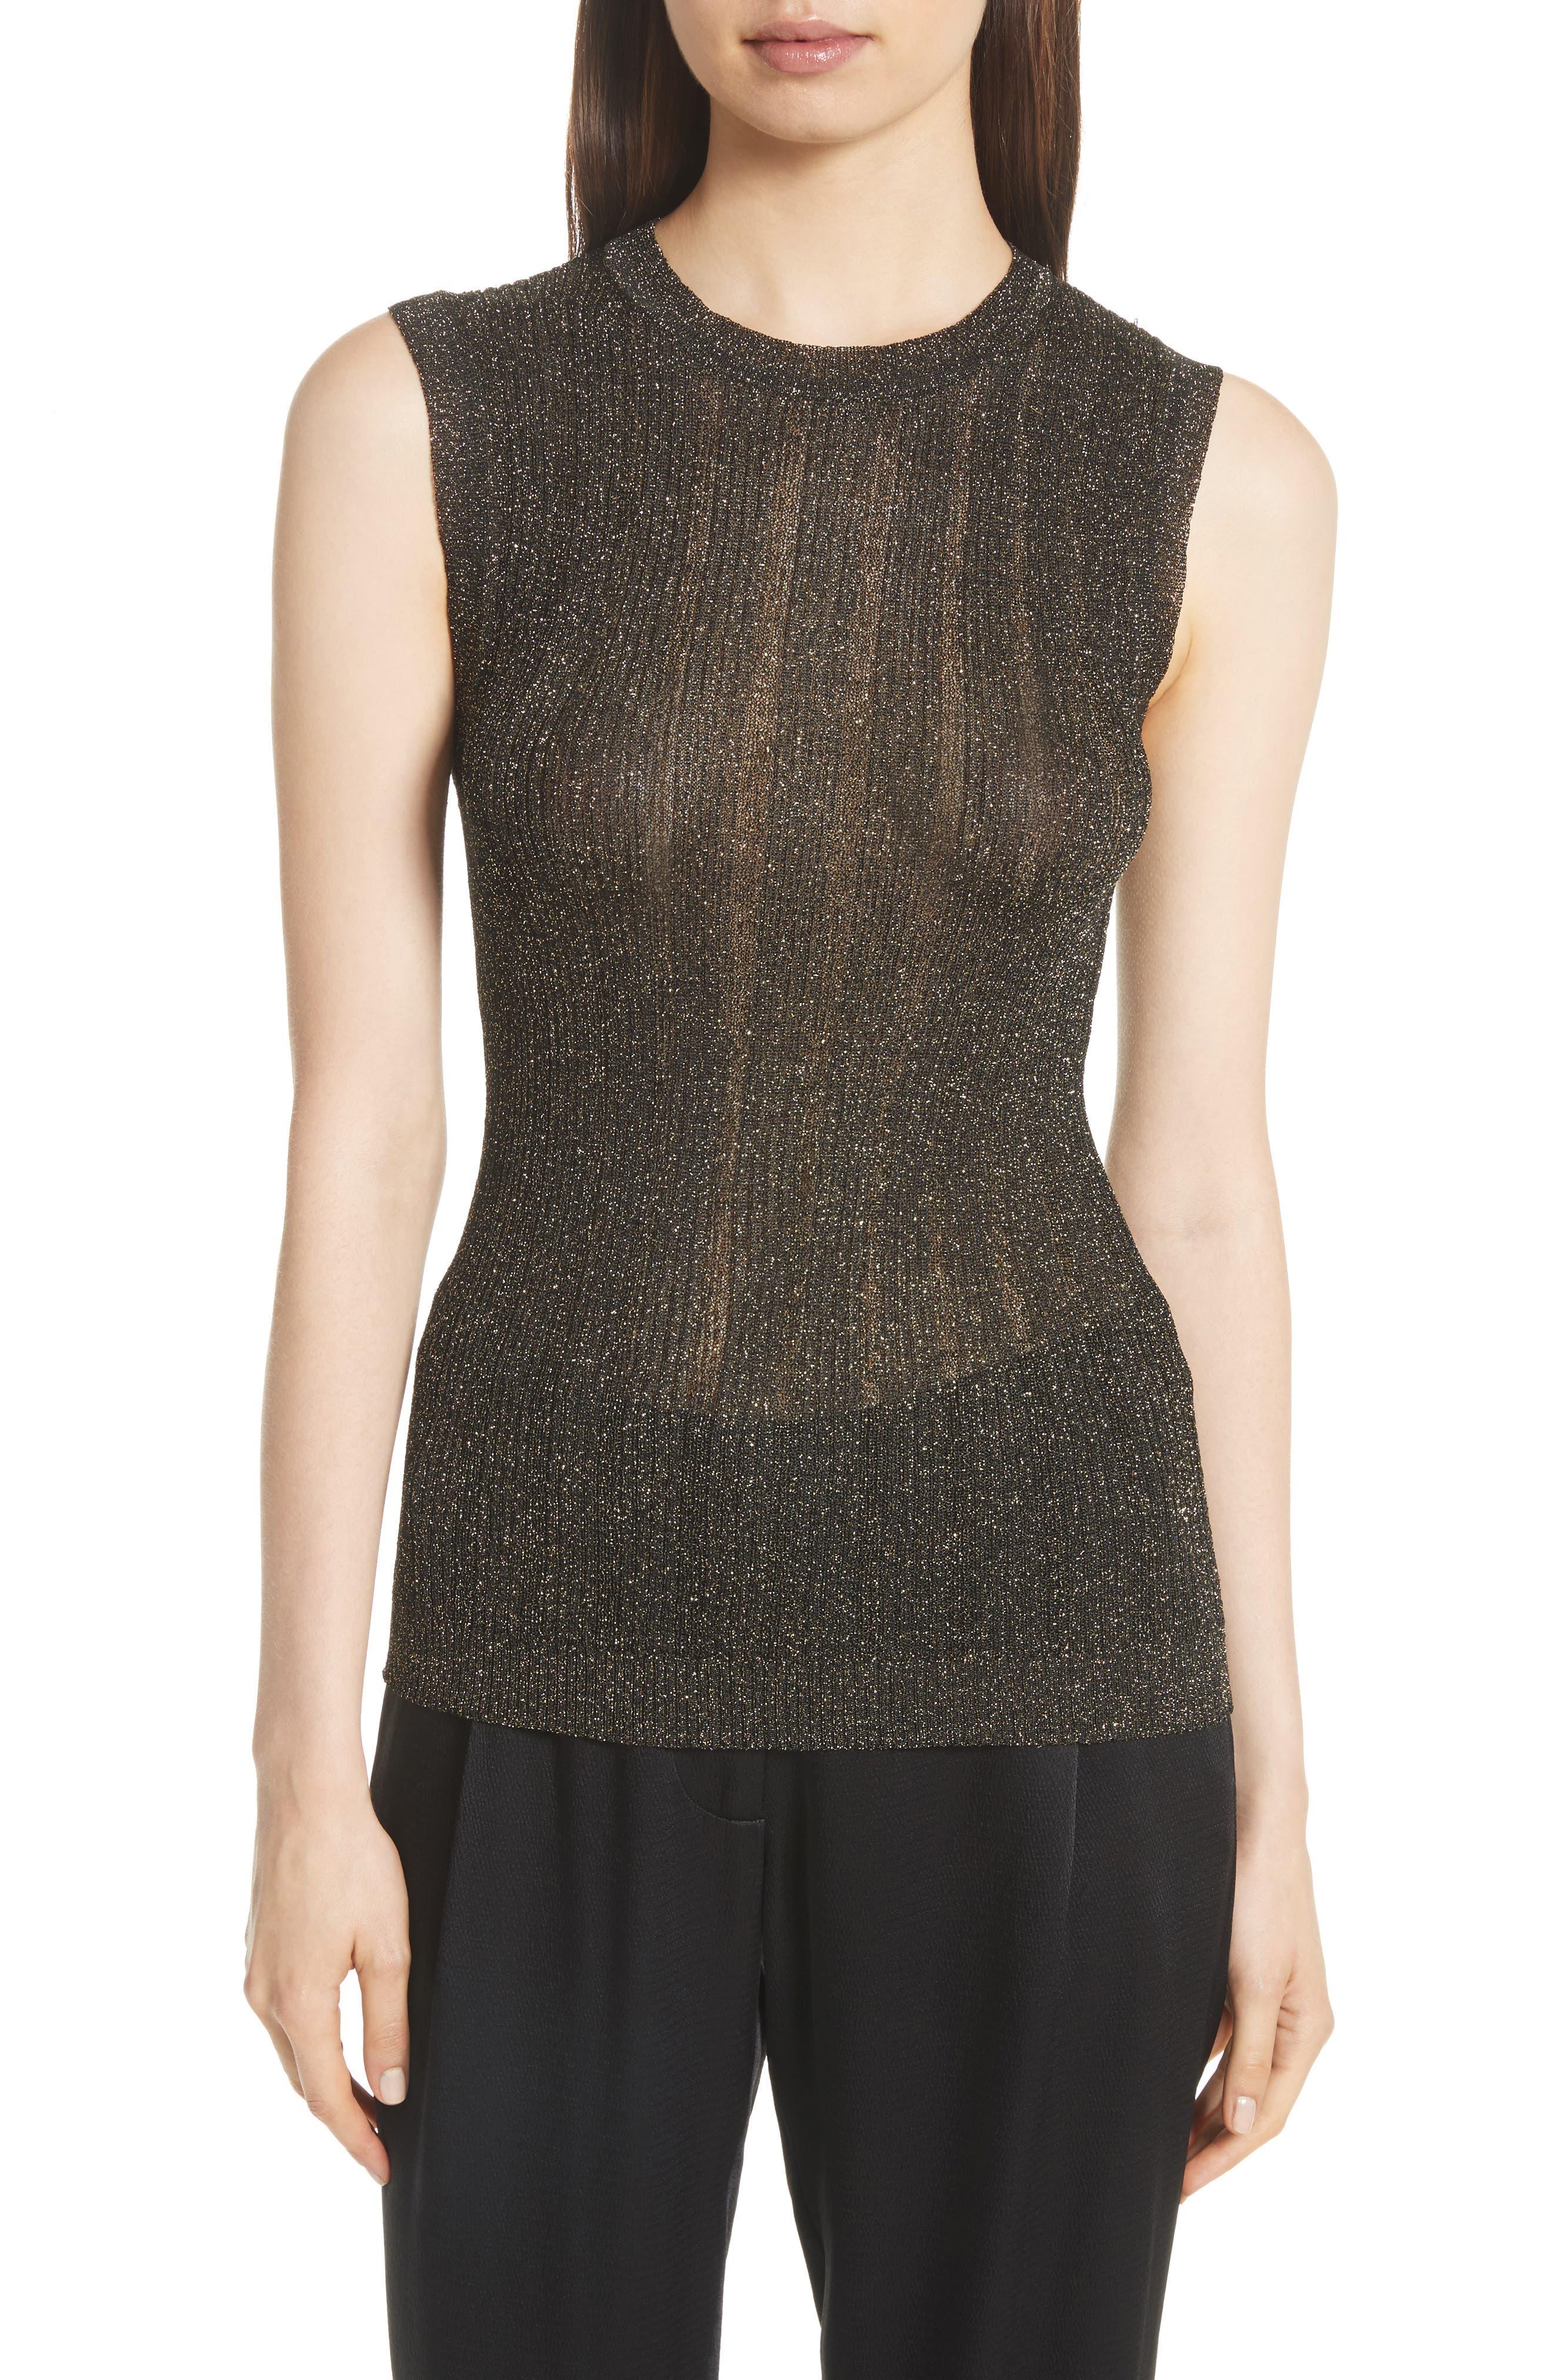 Alternate Image 1 Selected - Nili Lotan Lace Metallic Knit Top